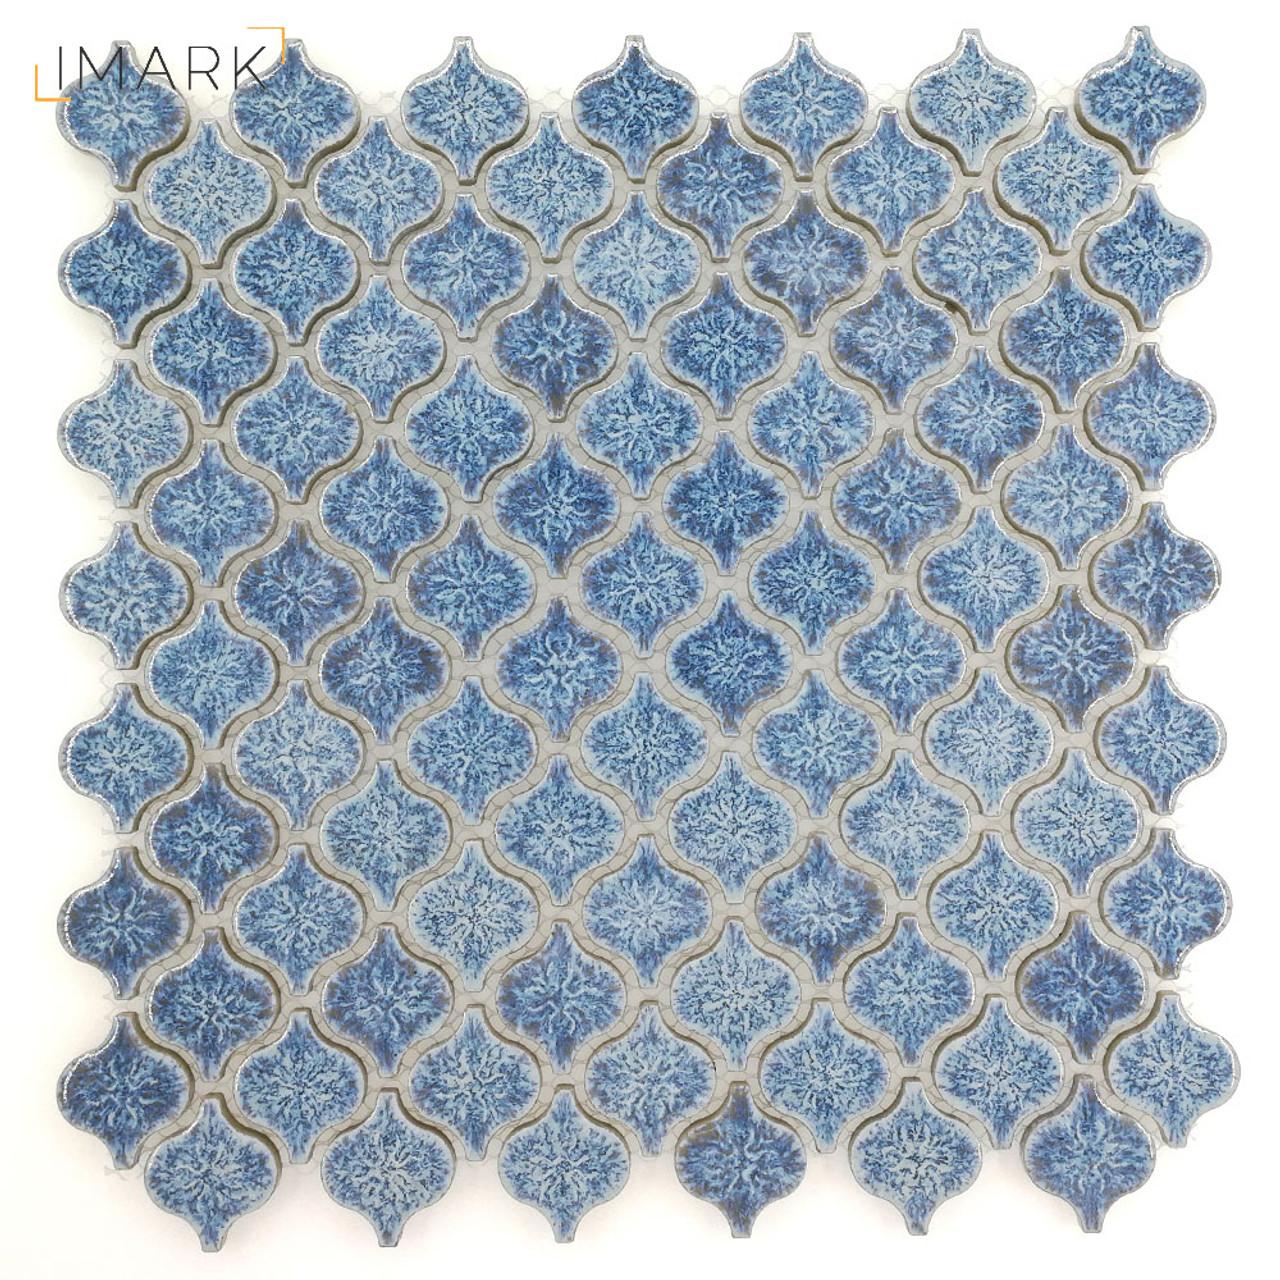 Lantern Mini Cobalt Blue Ceramic Mosaic Tile For